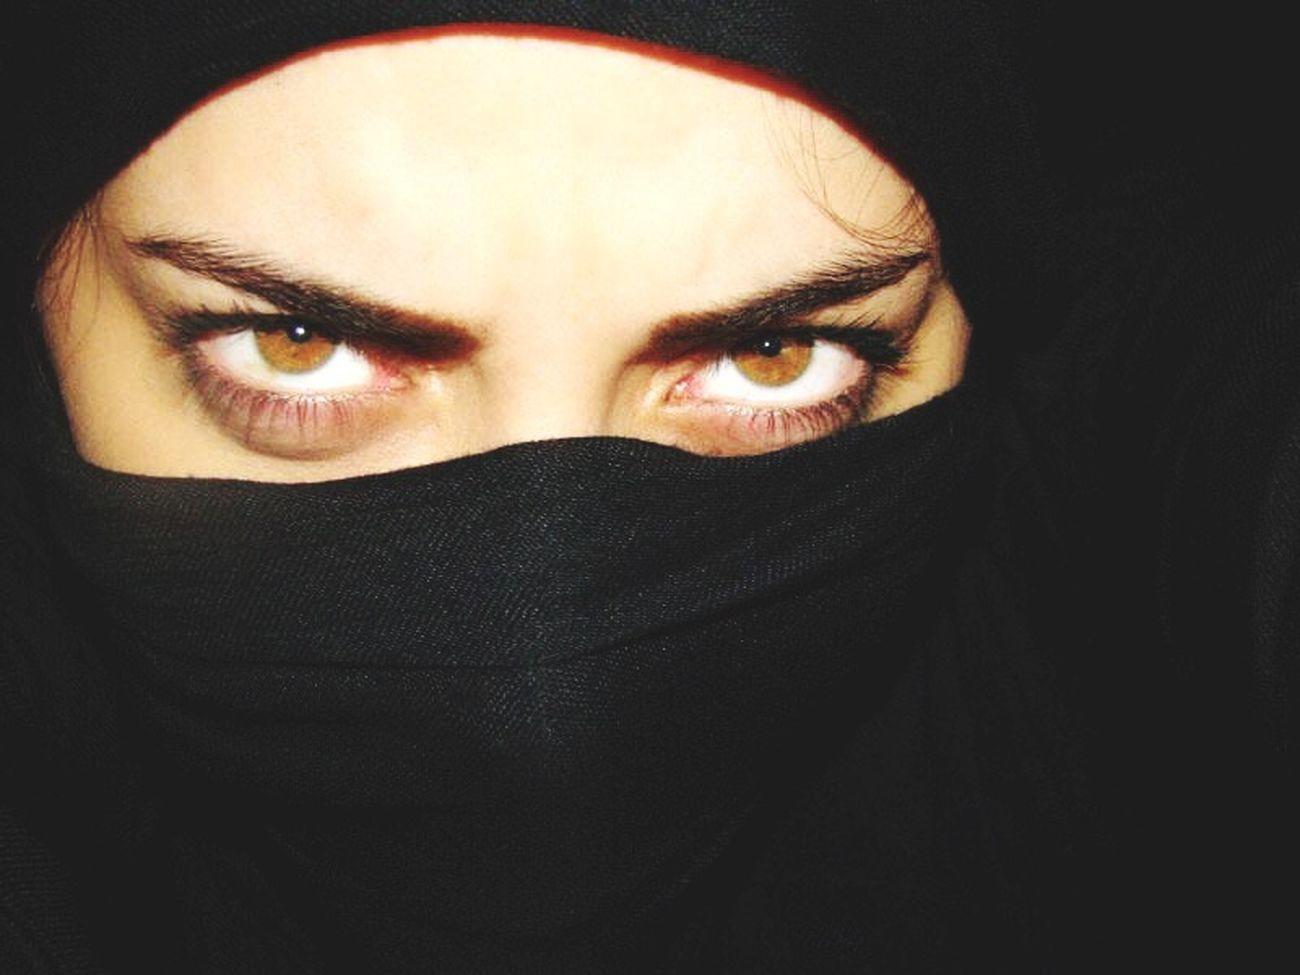 My Eyes Angry Eyes That Is Me Persian Iran Tehran